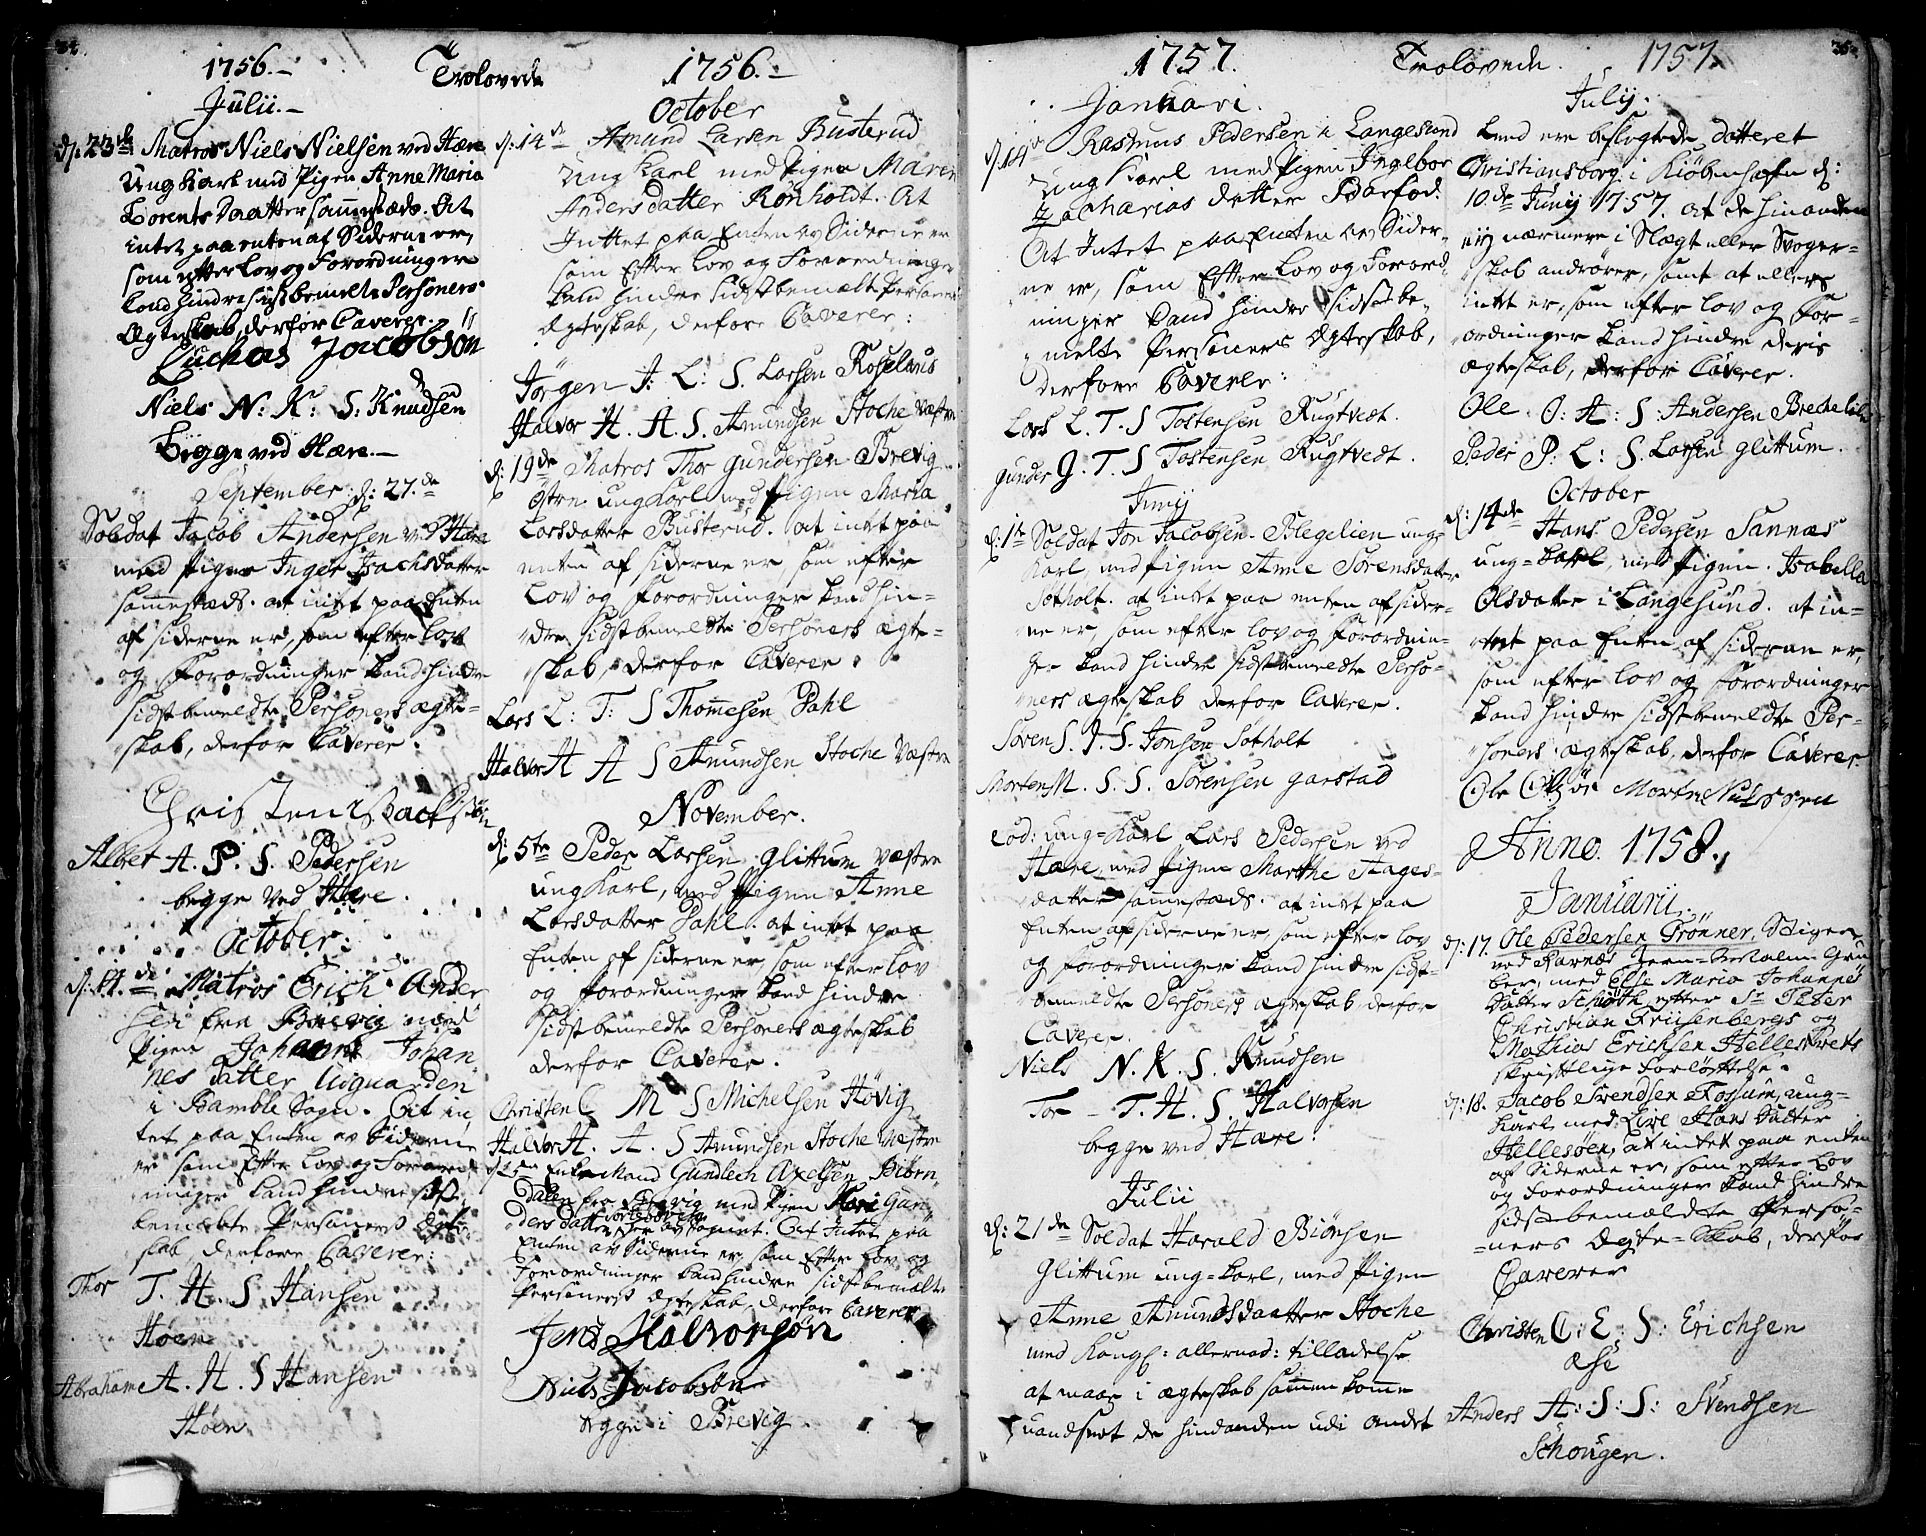 SAKO, Bamble kirkebøker, F/Fa/L0001: Ministerialbok nr. I 1, 1702-1774, s. 34-35